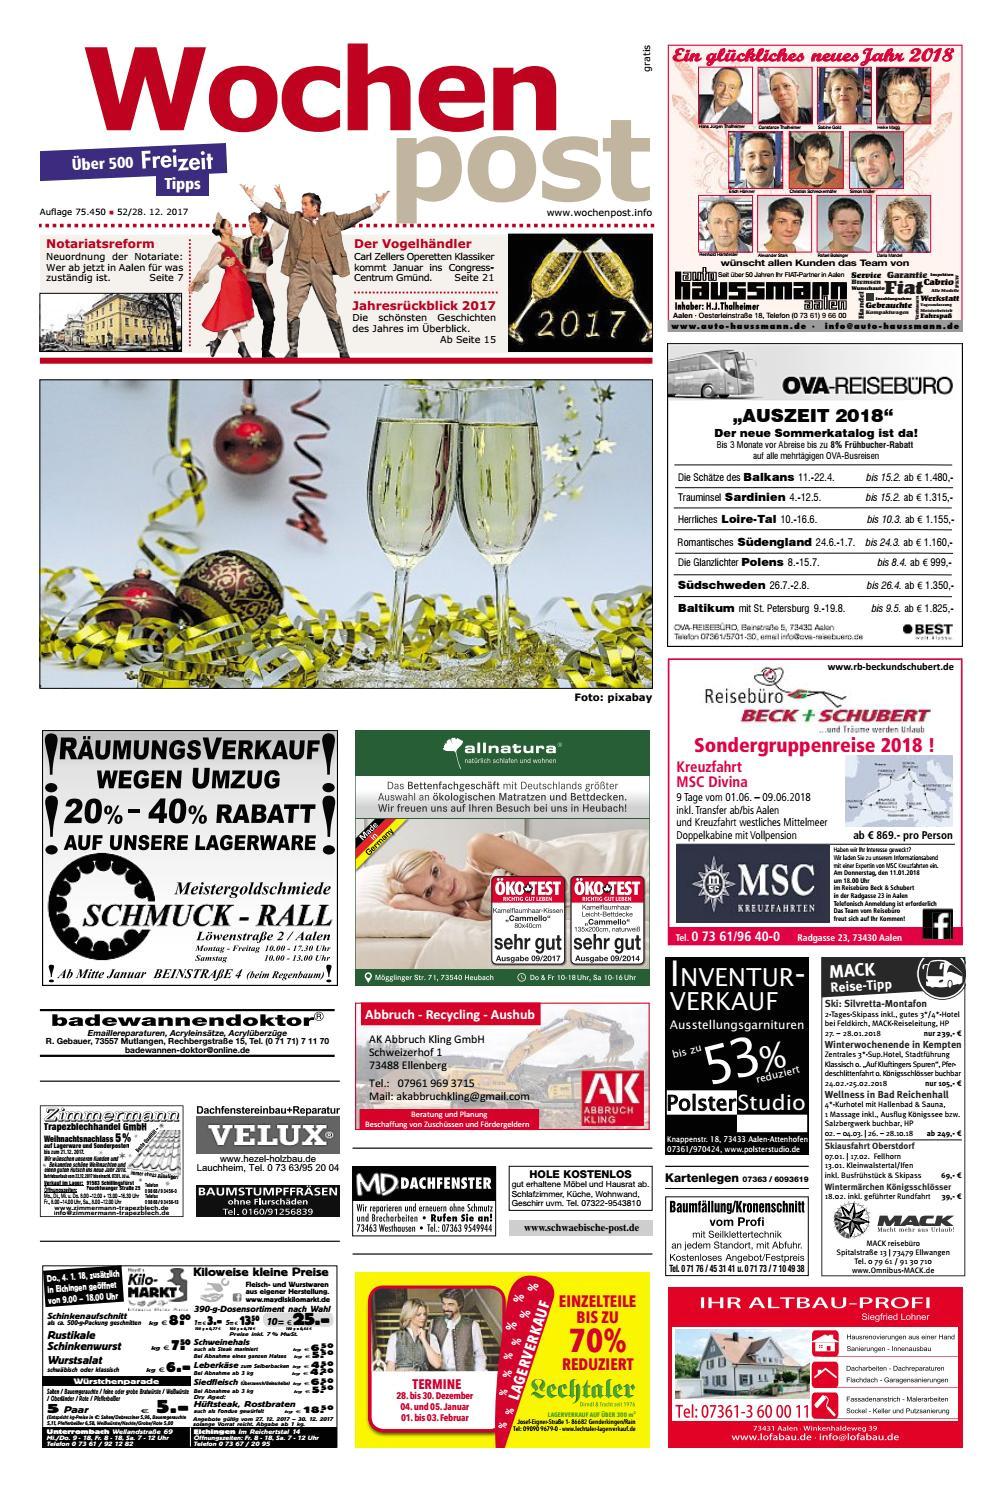 The Living Desert Coupons 2019 Die Wochenpost Kw 52 by Sdz Medien issuu